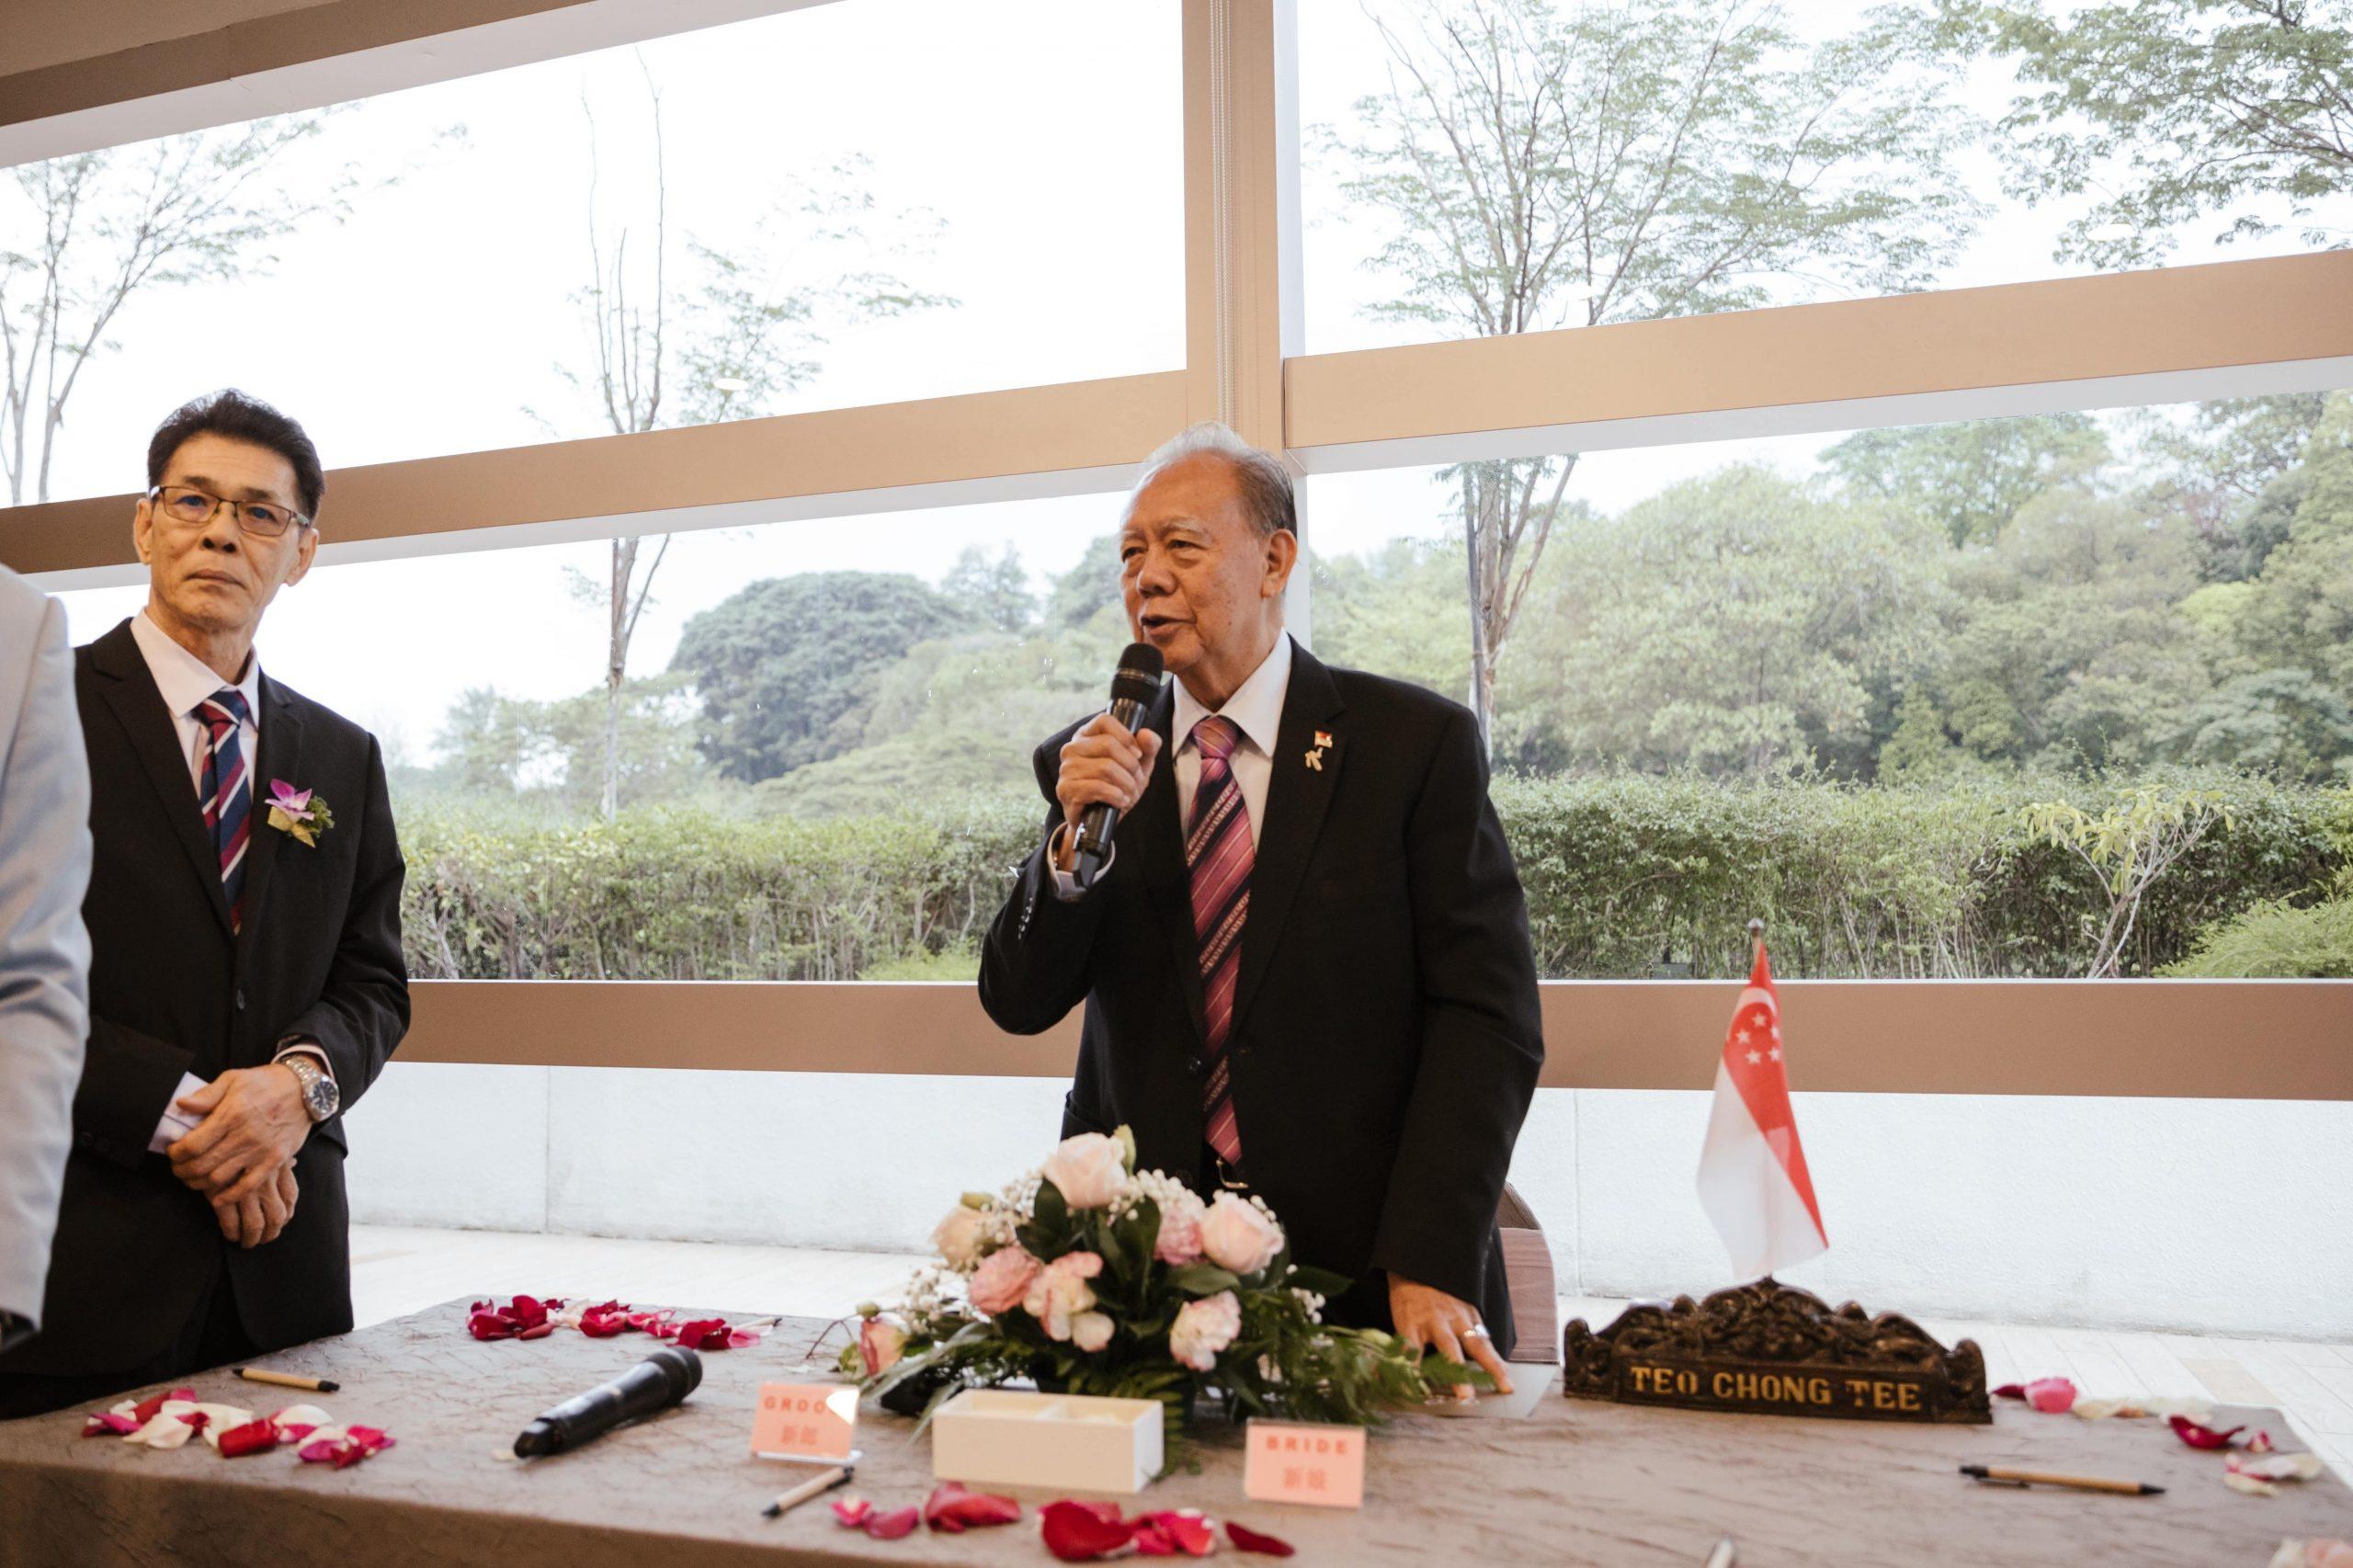 Solemnisation Ceremony Wedding Singapore Solemniser Teo Cheong Tee